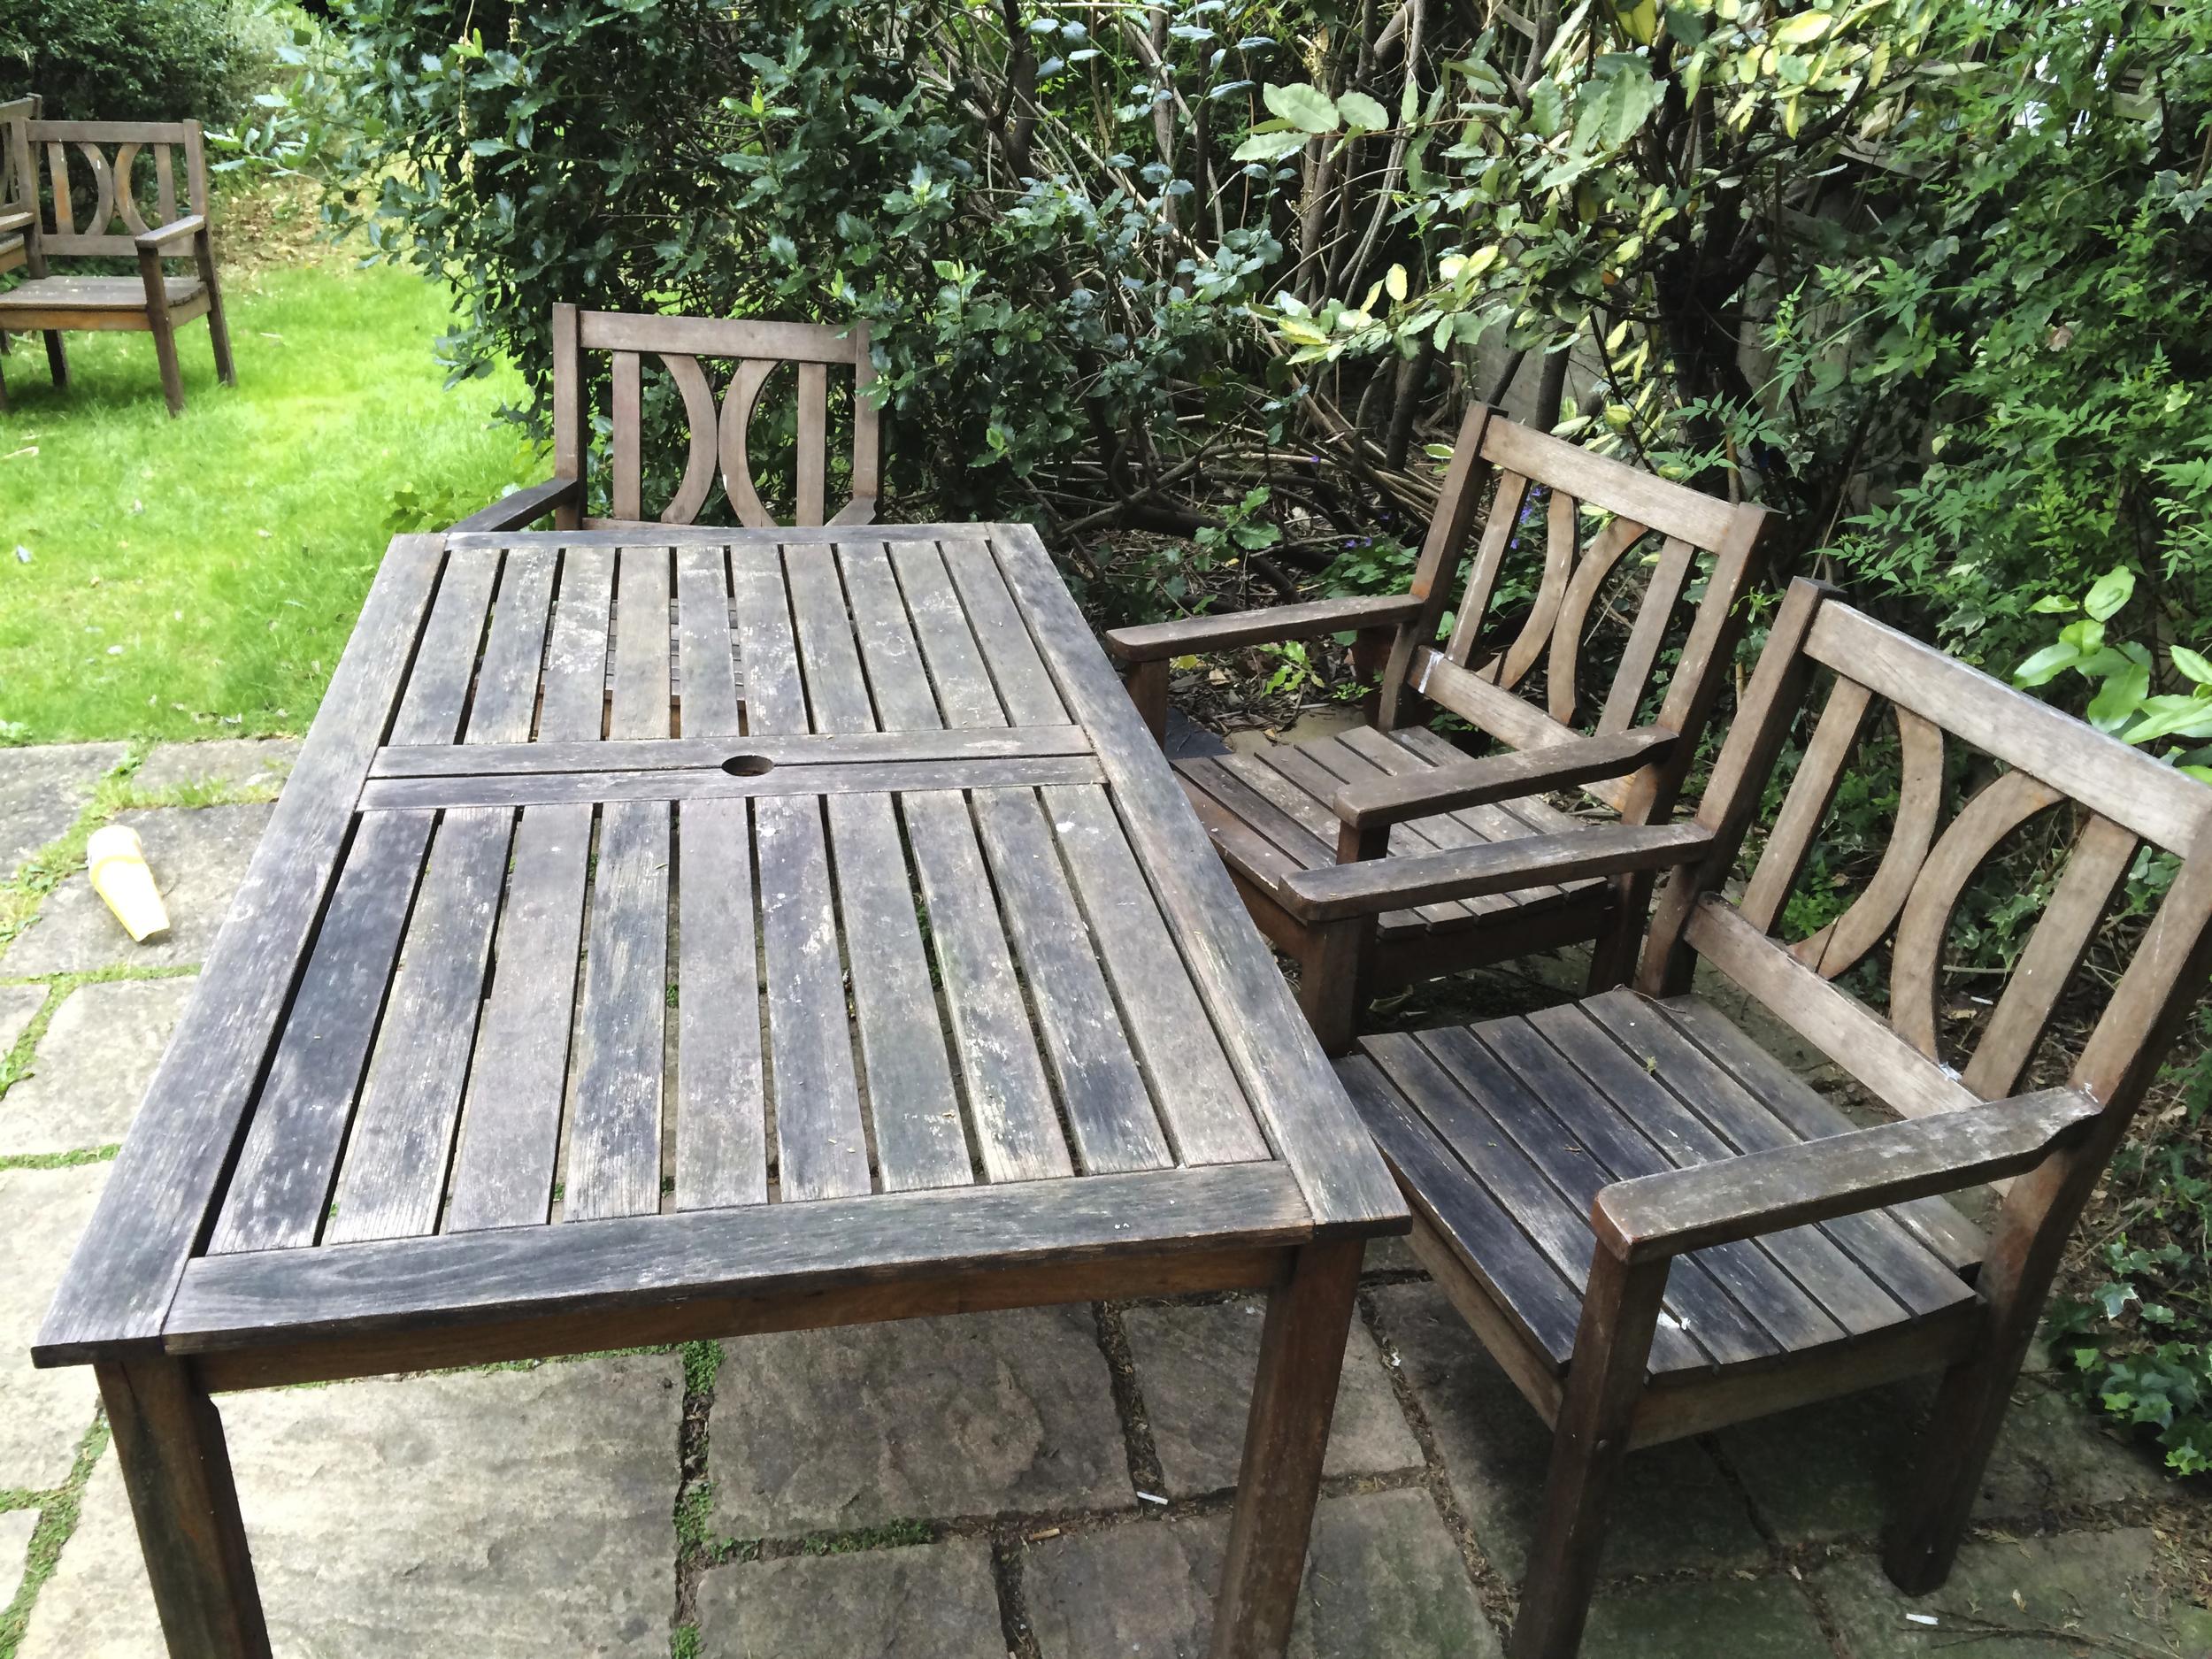 #NHRenovations #Painter #Decorator #London #Holloway #Garden #Furniture #Old